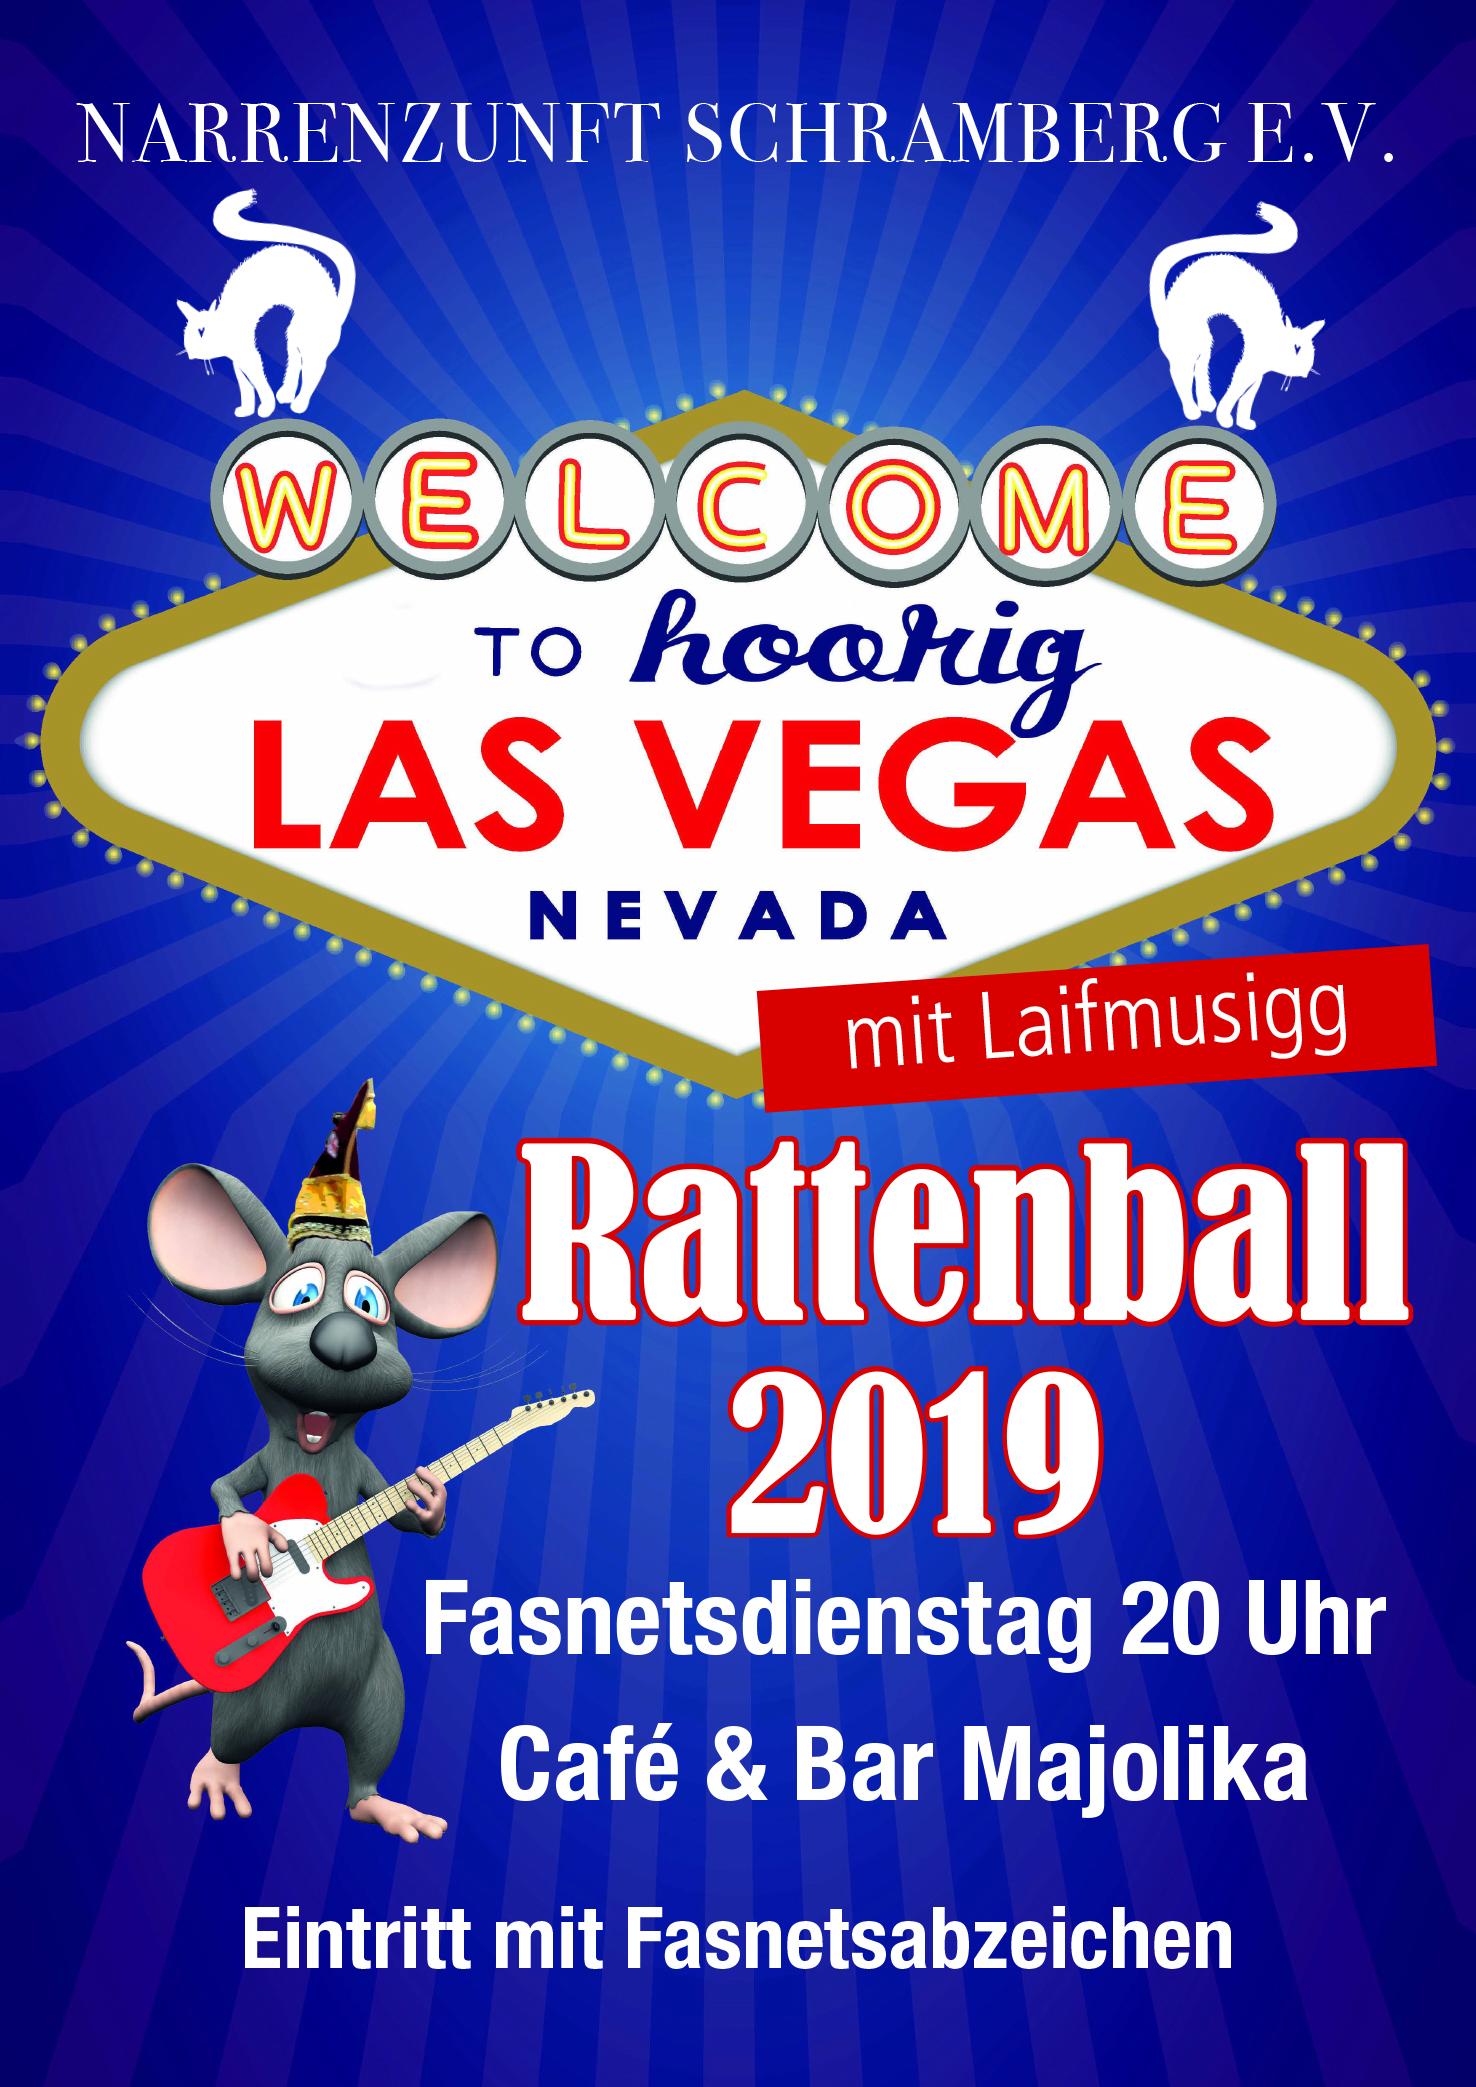 Rattenball 2019